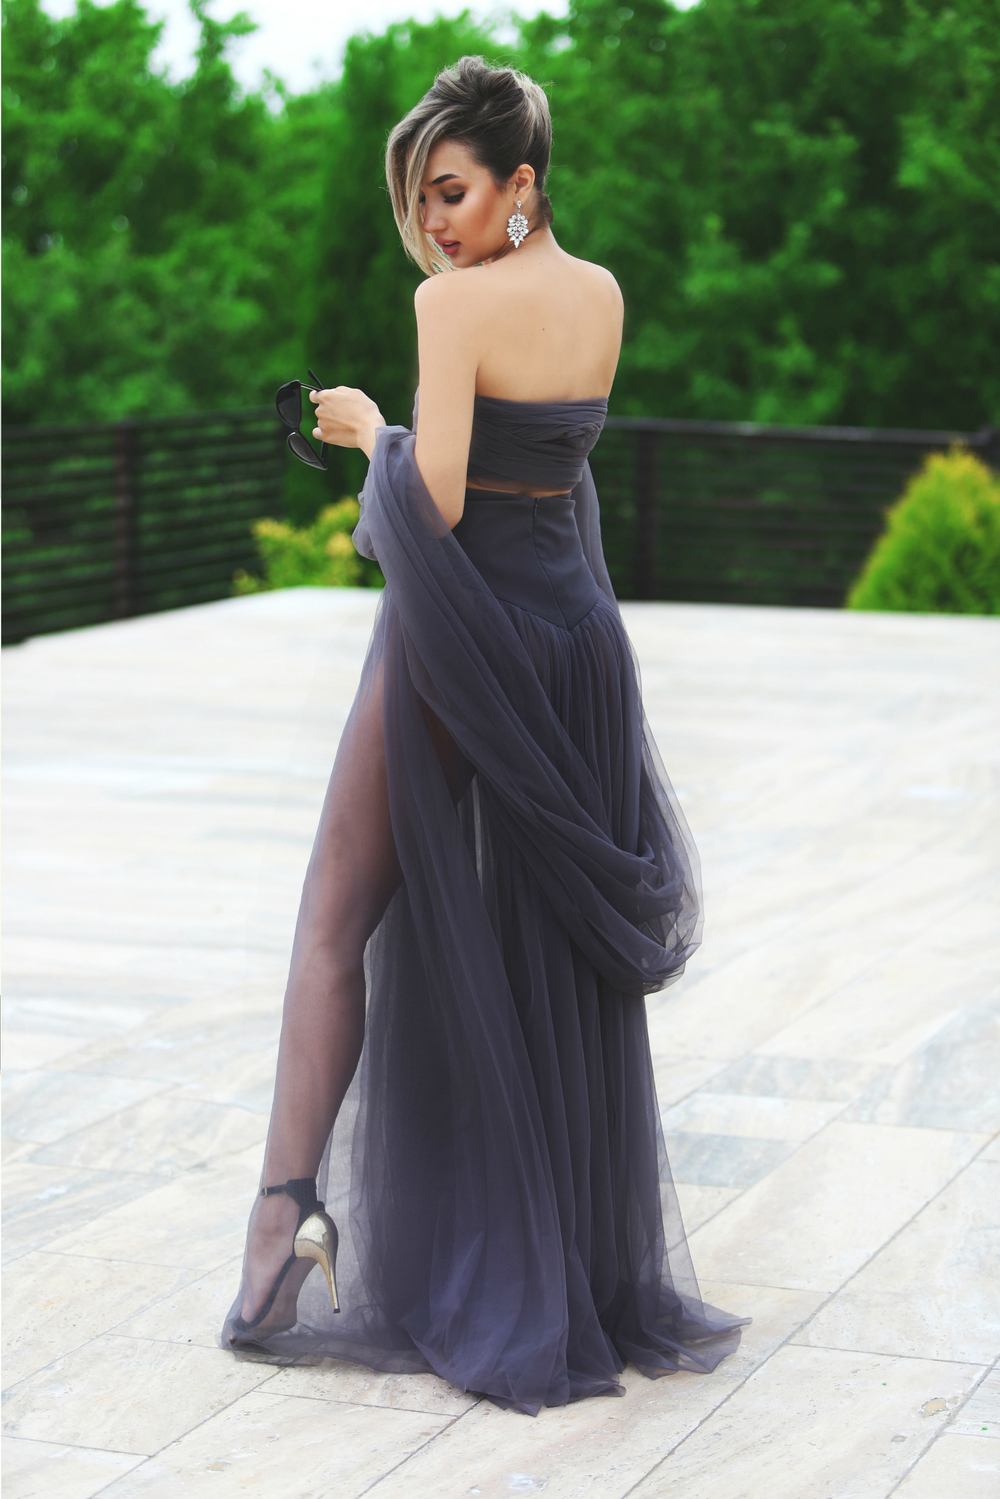 Diana Rogo Dress Banchet 03 a.jpg